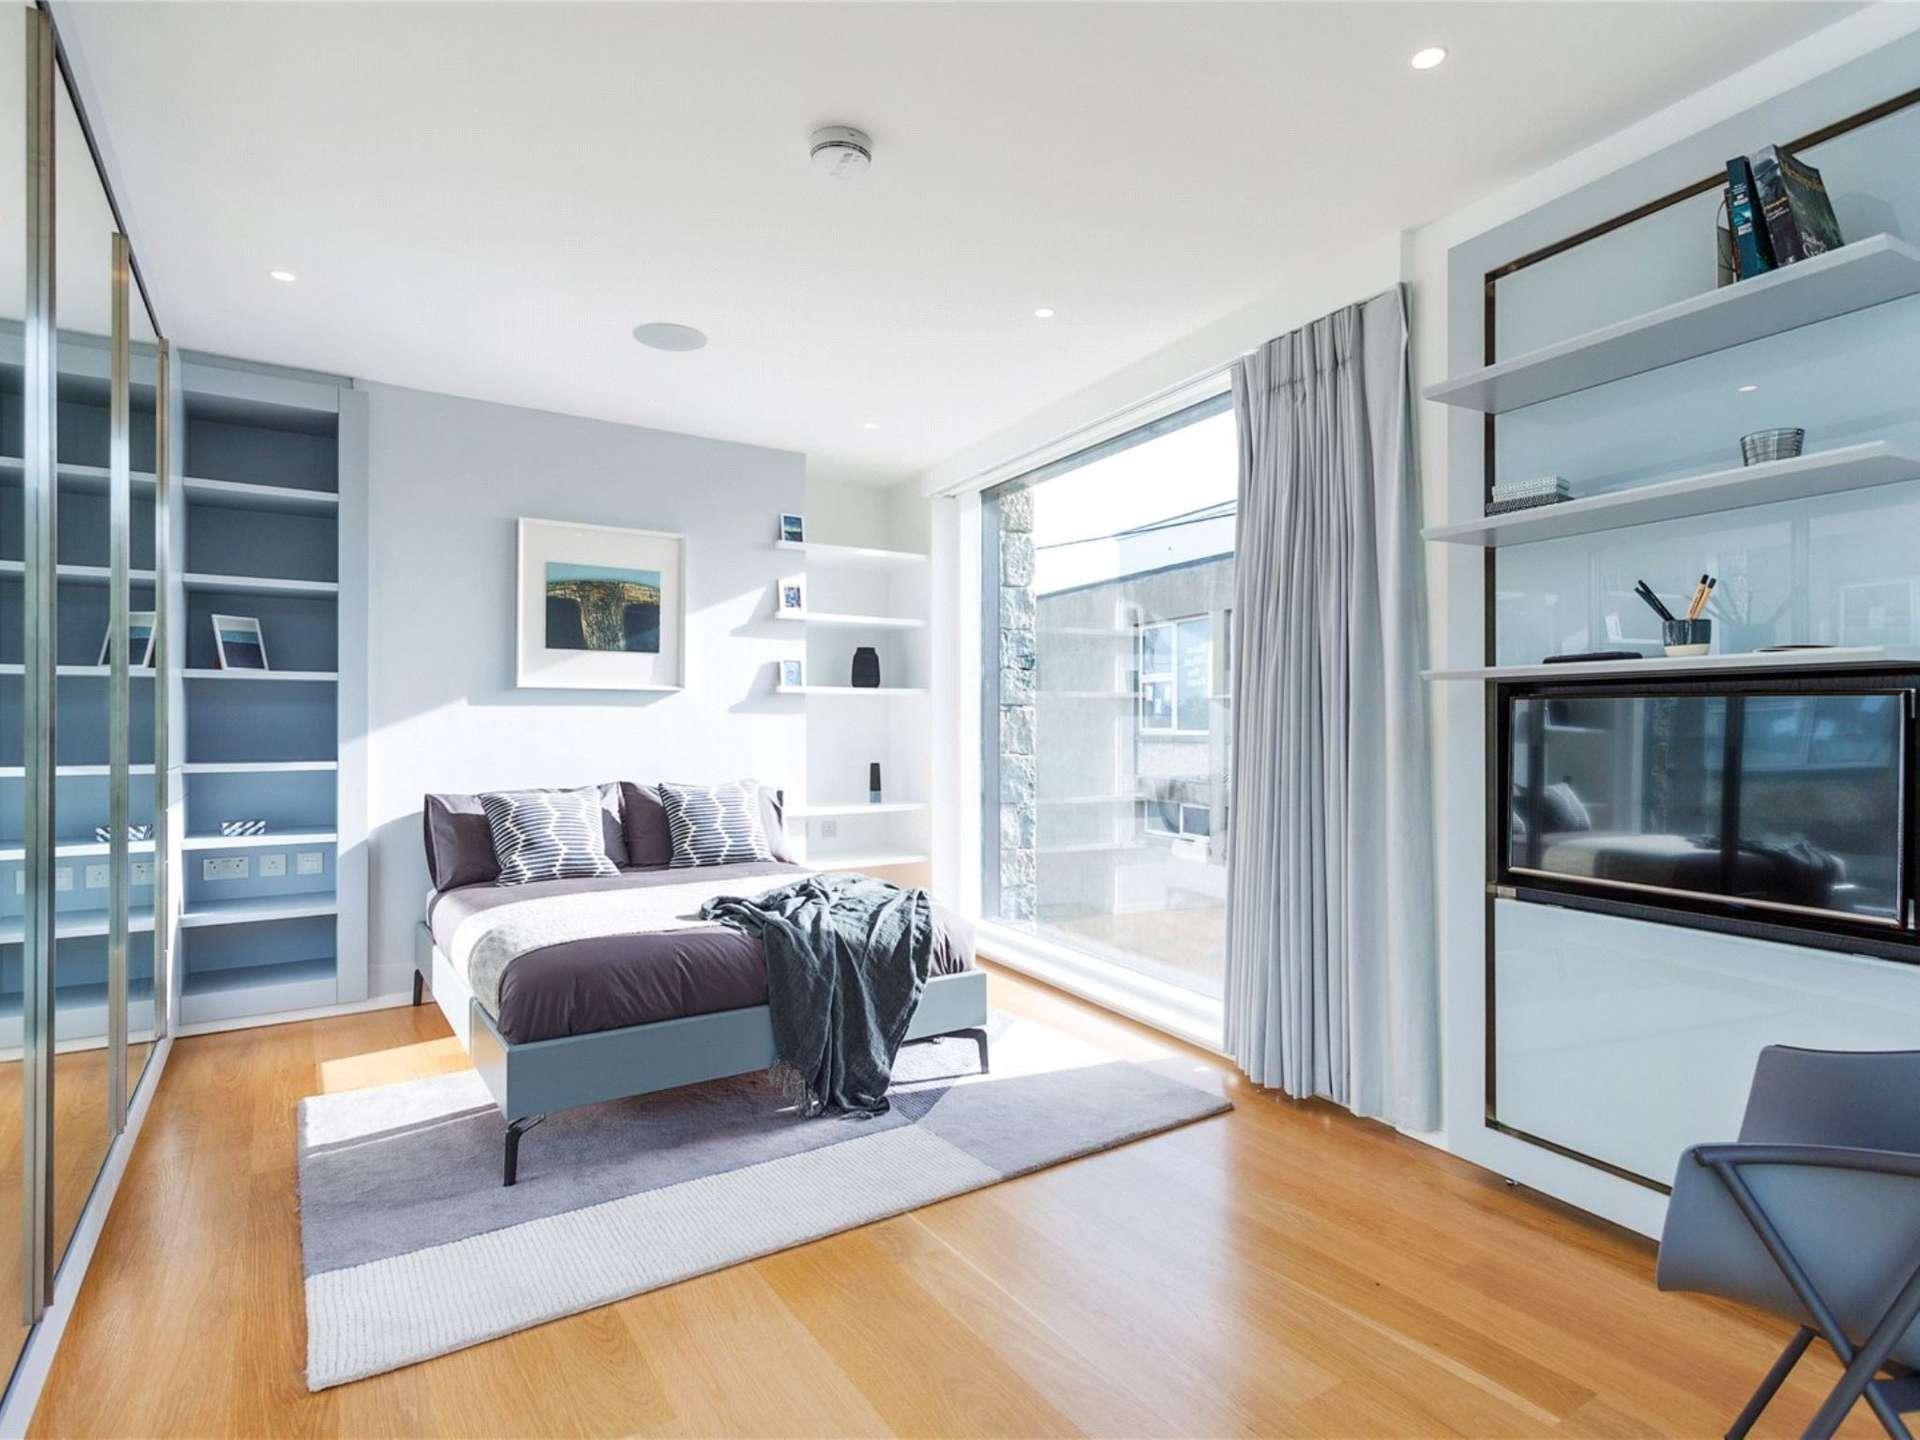 Savills | Property for sale in Dalkey, Dublin, Leinster, Ireland